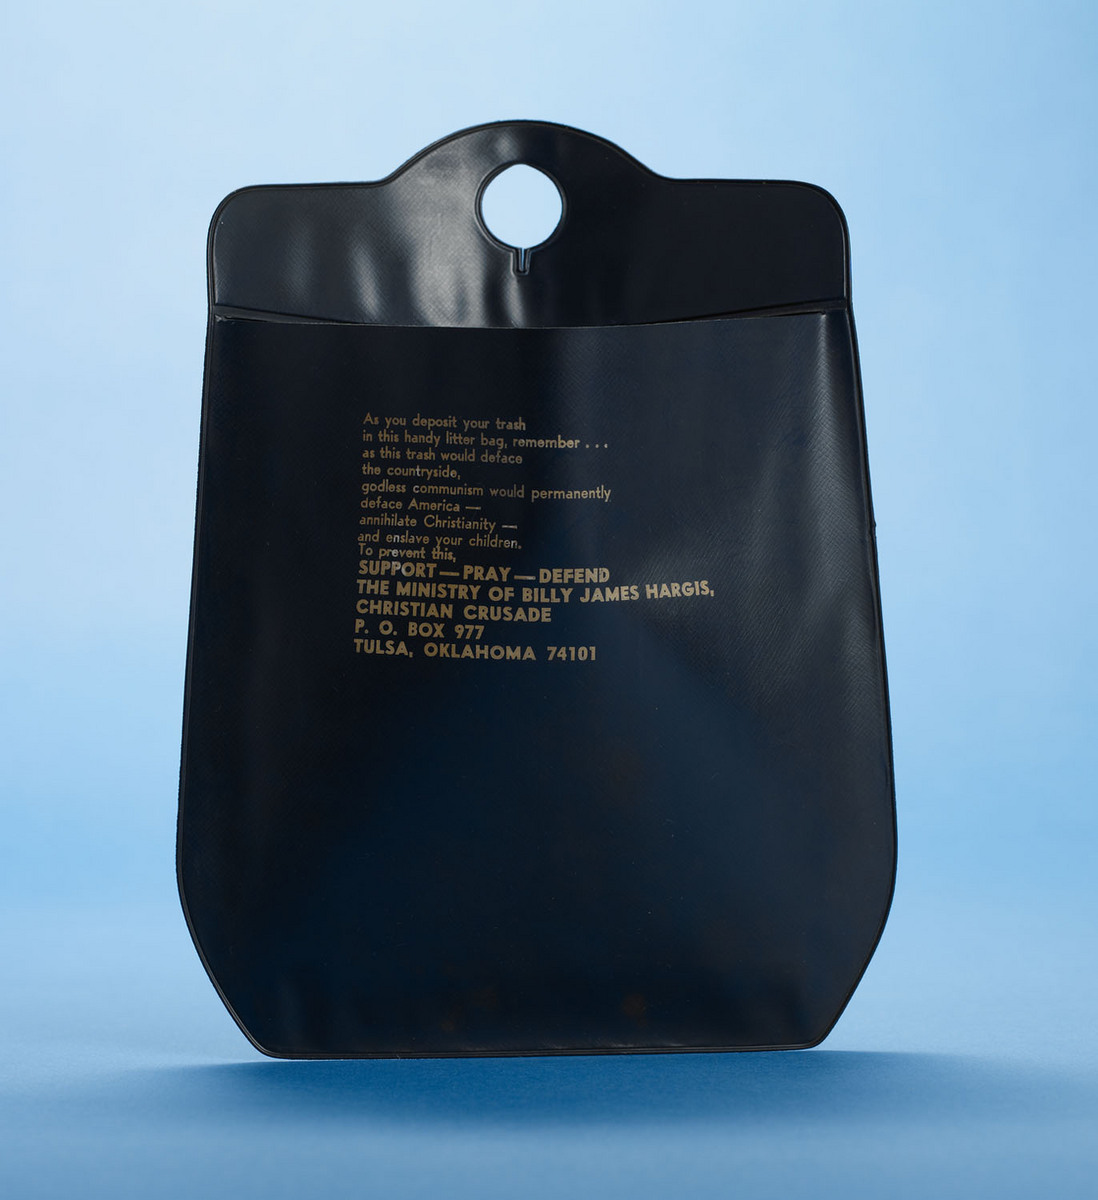 Christian Crusade litter bag, front